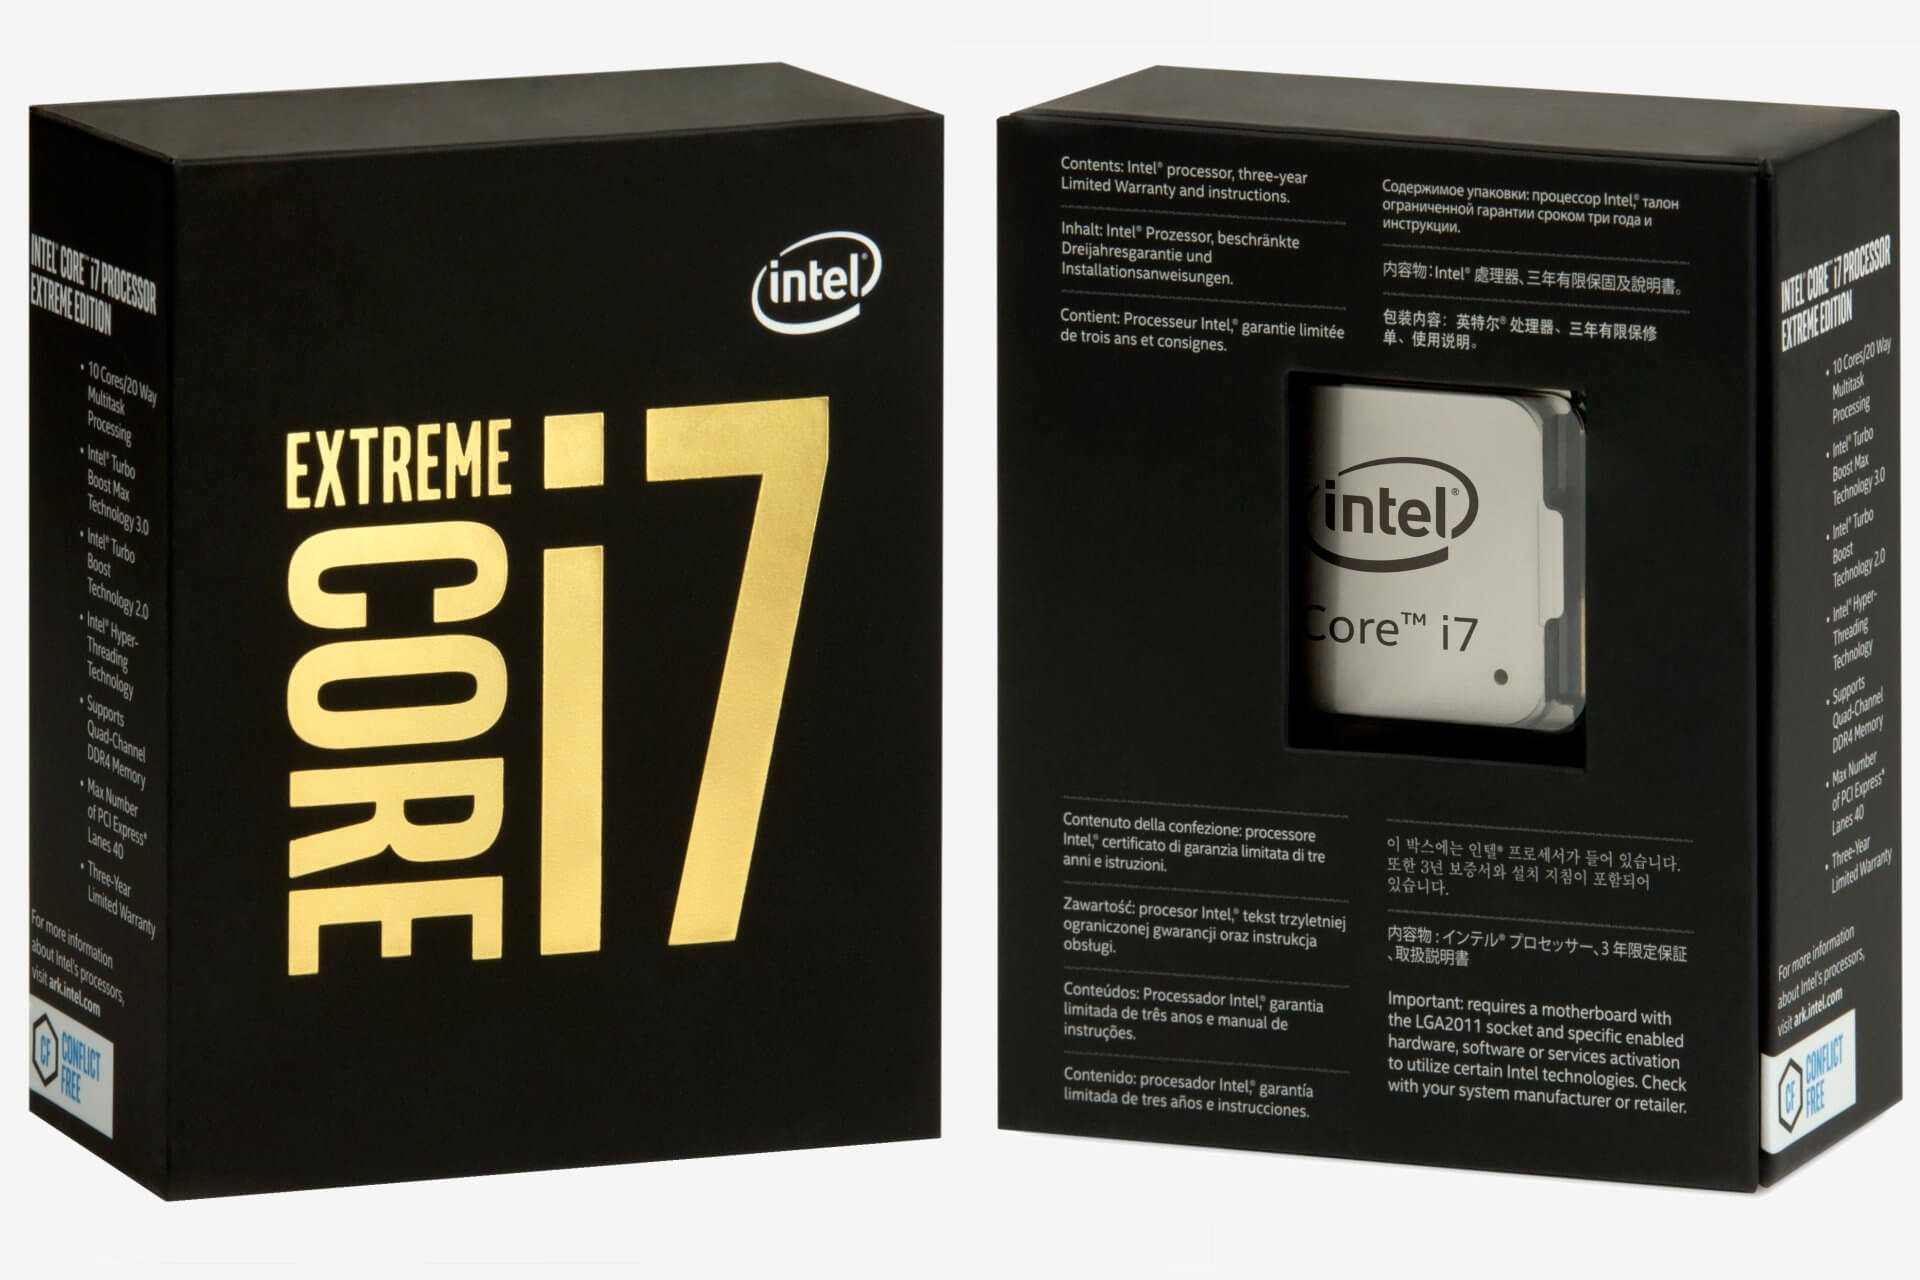 Intel Core i7-6950X Broadwell-E Review - The First 10-core Desktop CPU - TechSpot